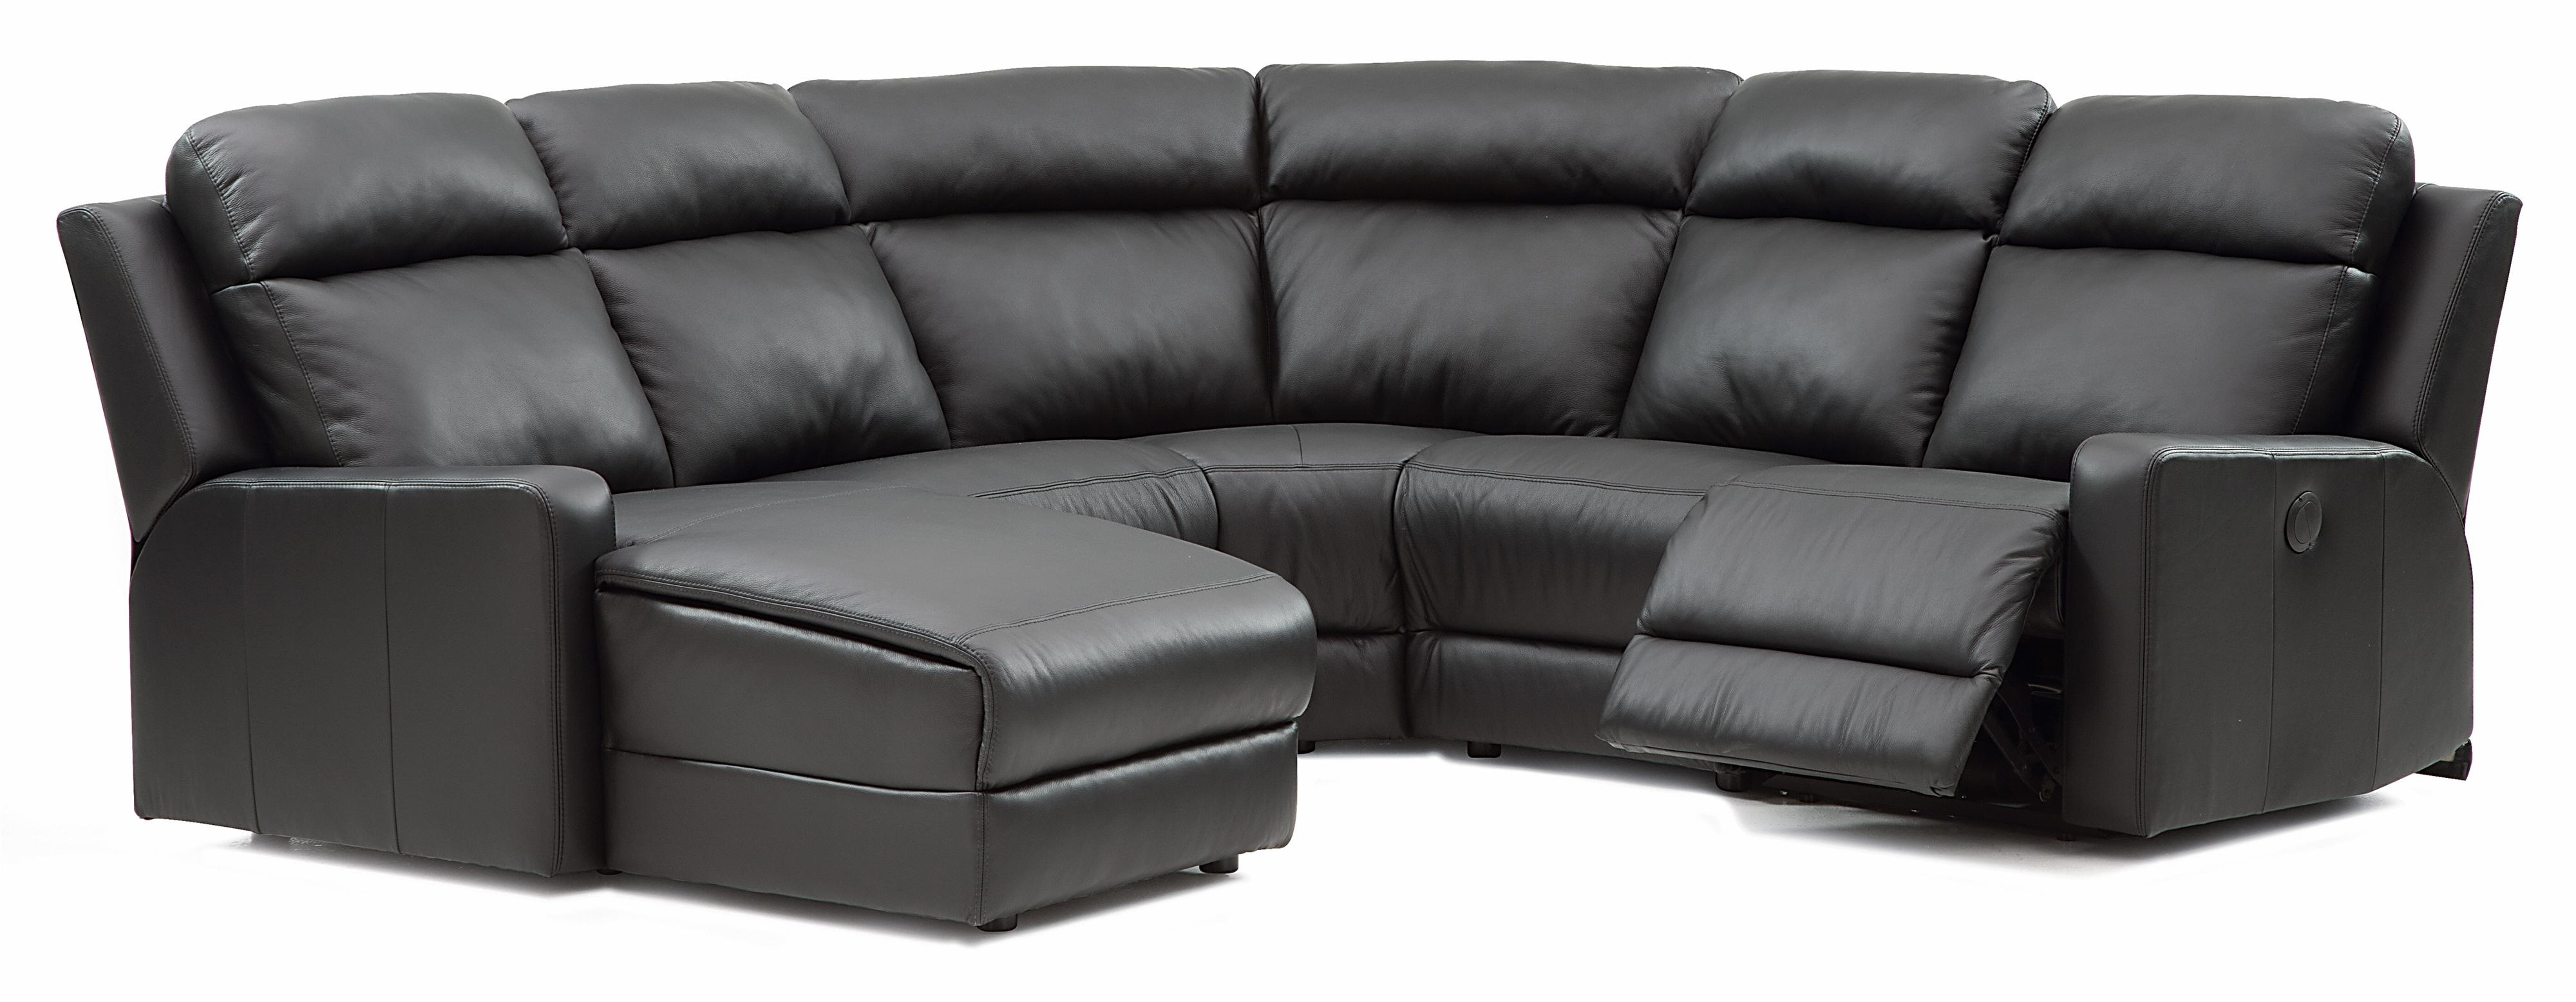 Power Recline Sofa Sectional